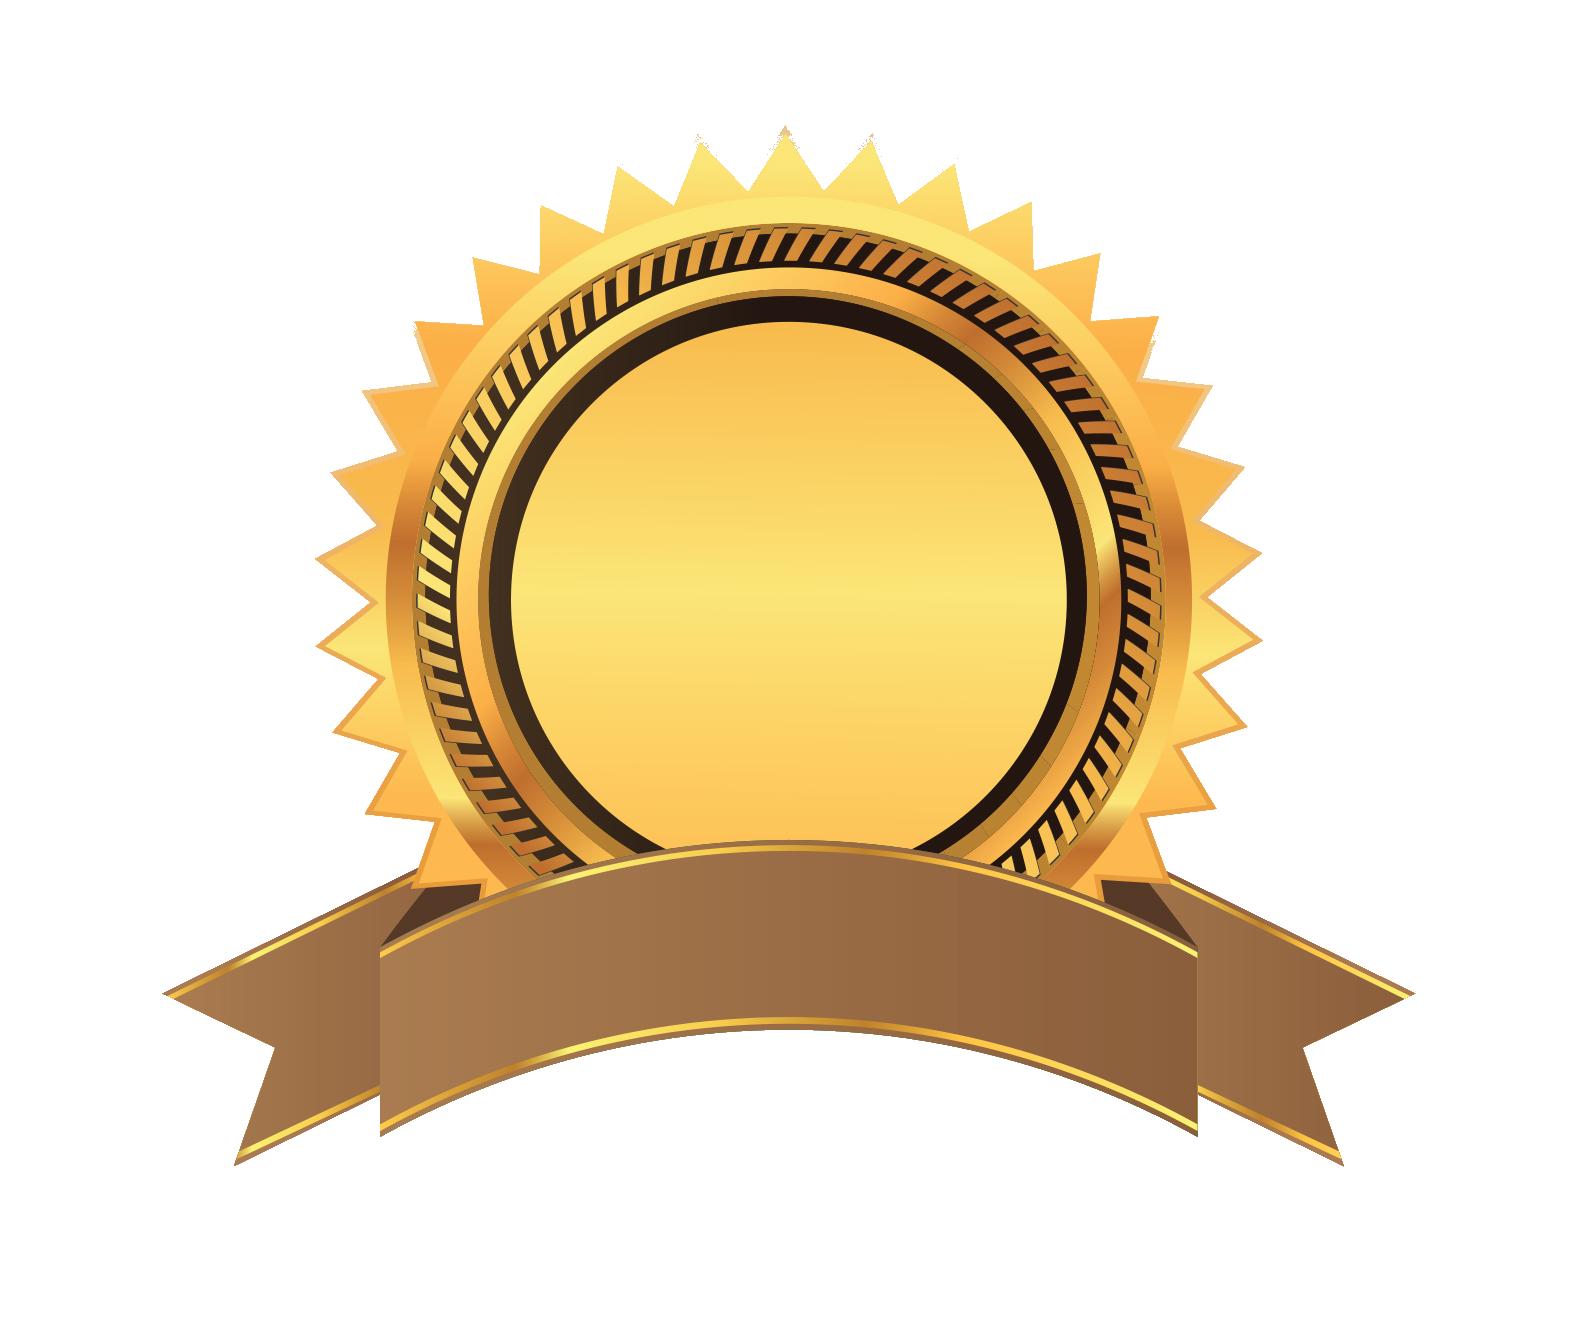 PNG Certificates Award - 154416